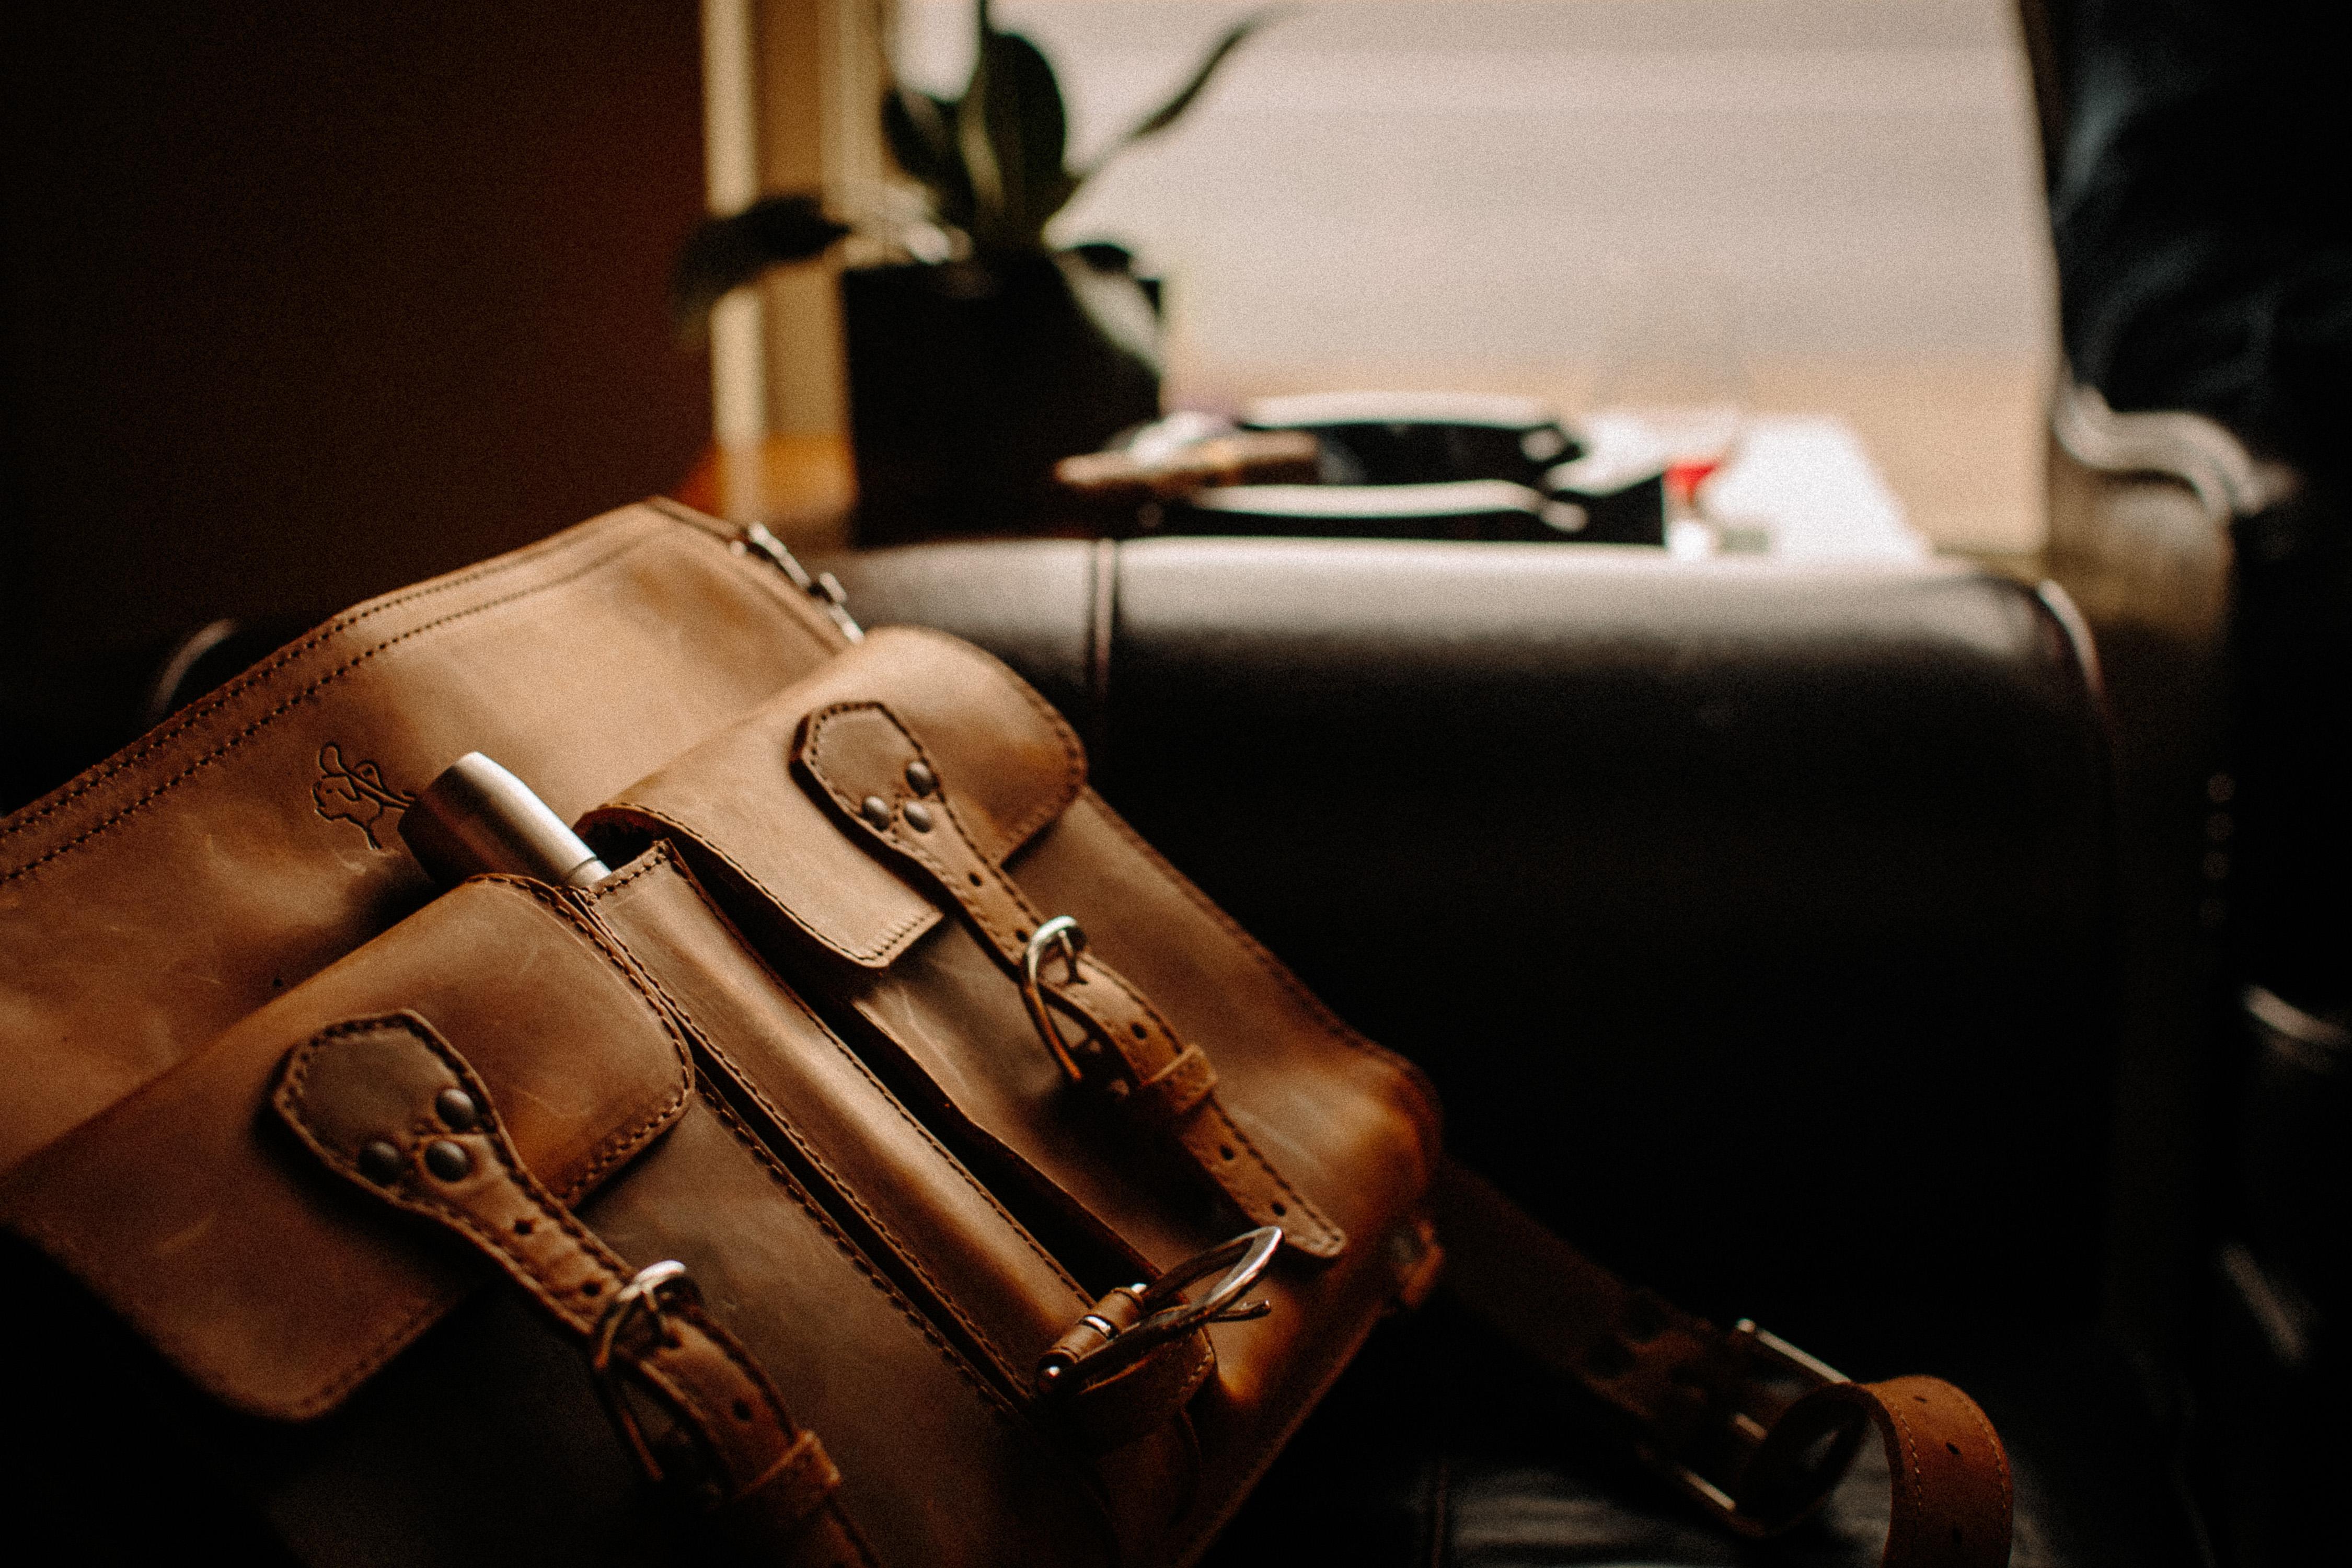 Satchel Cigar Case on Leather